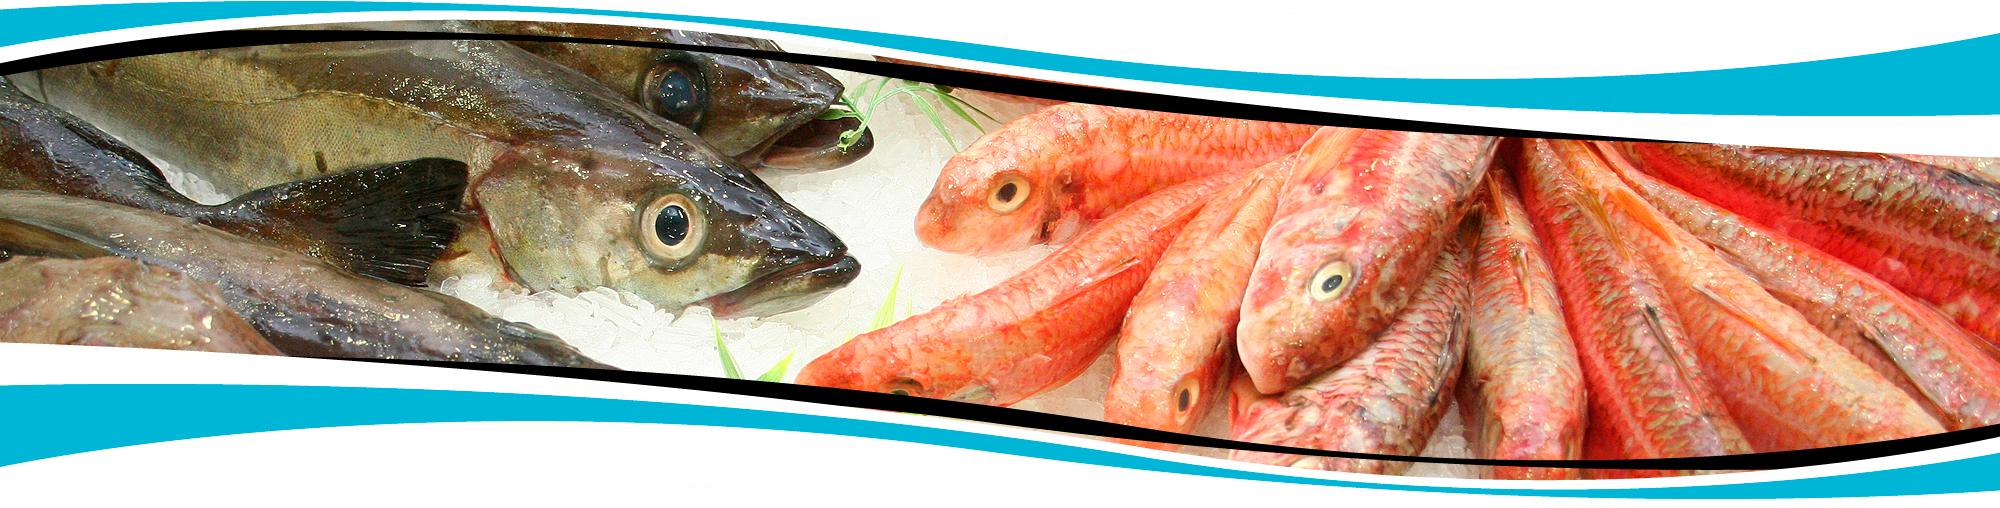 Pescados Rubén Venta De Pescado Congelado Elaborado Y Fresco